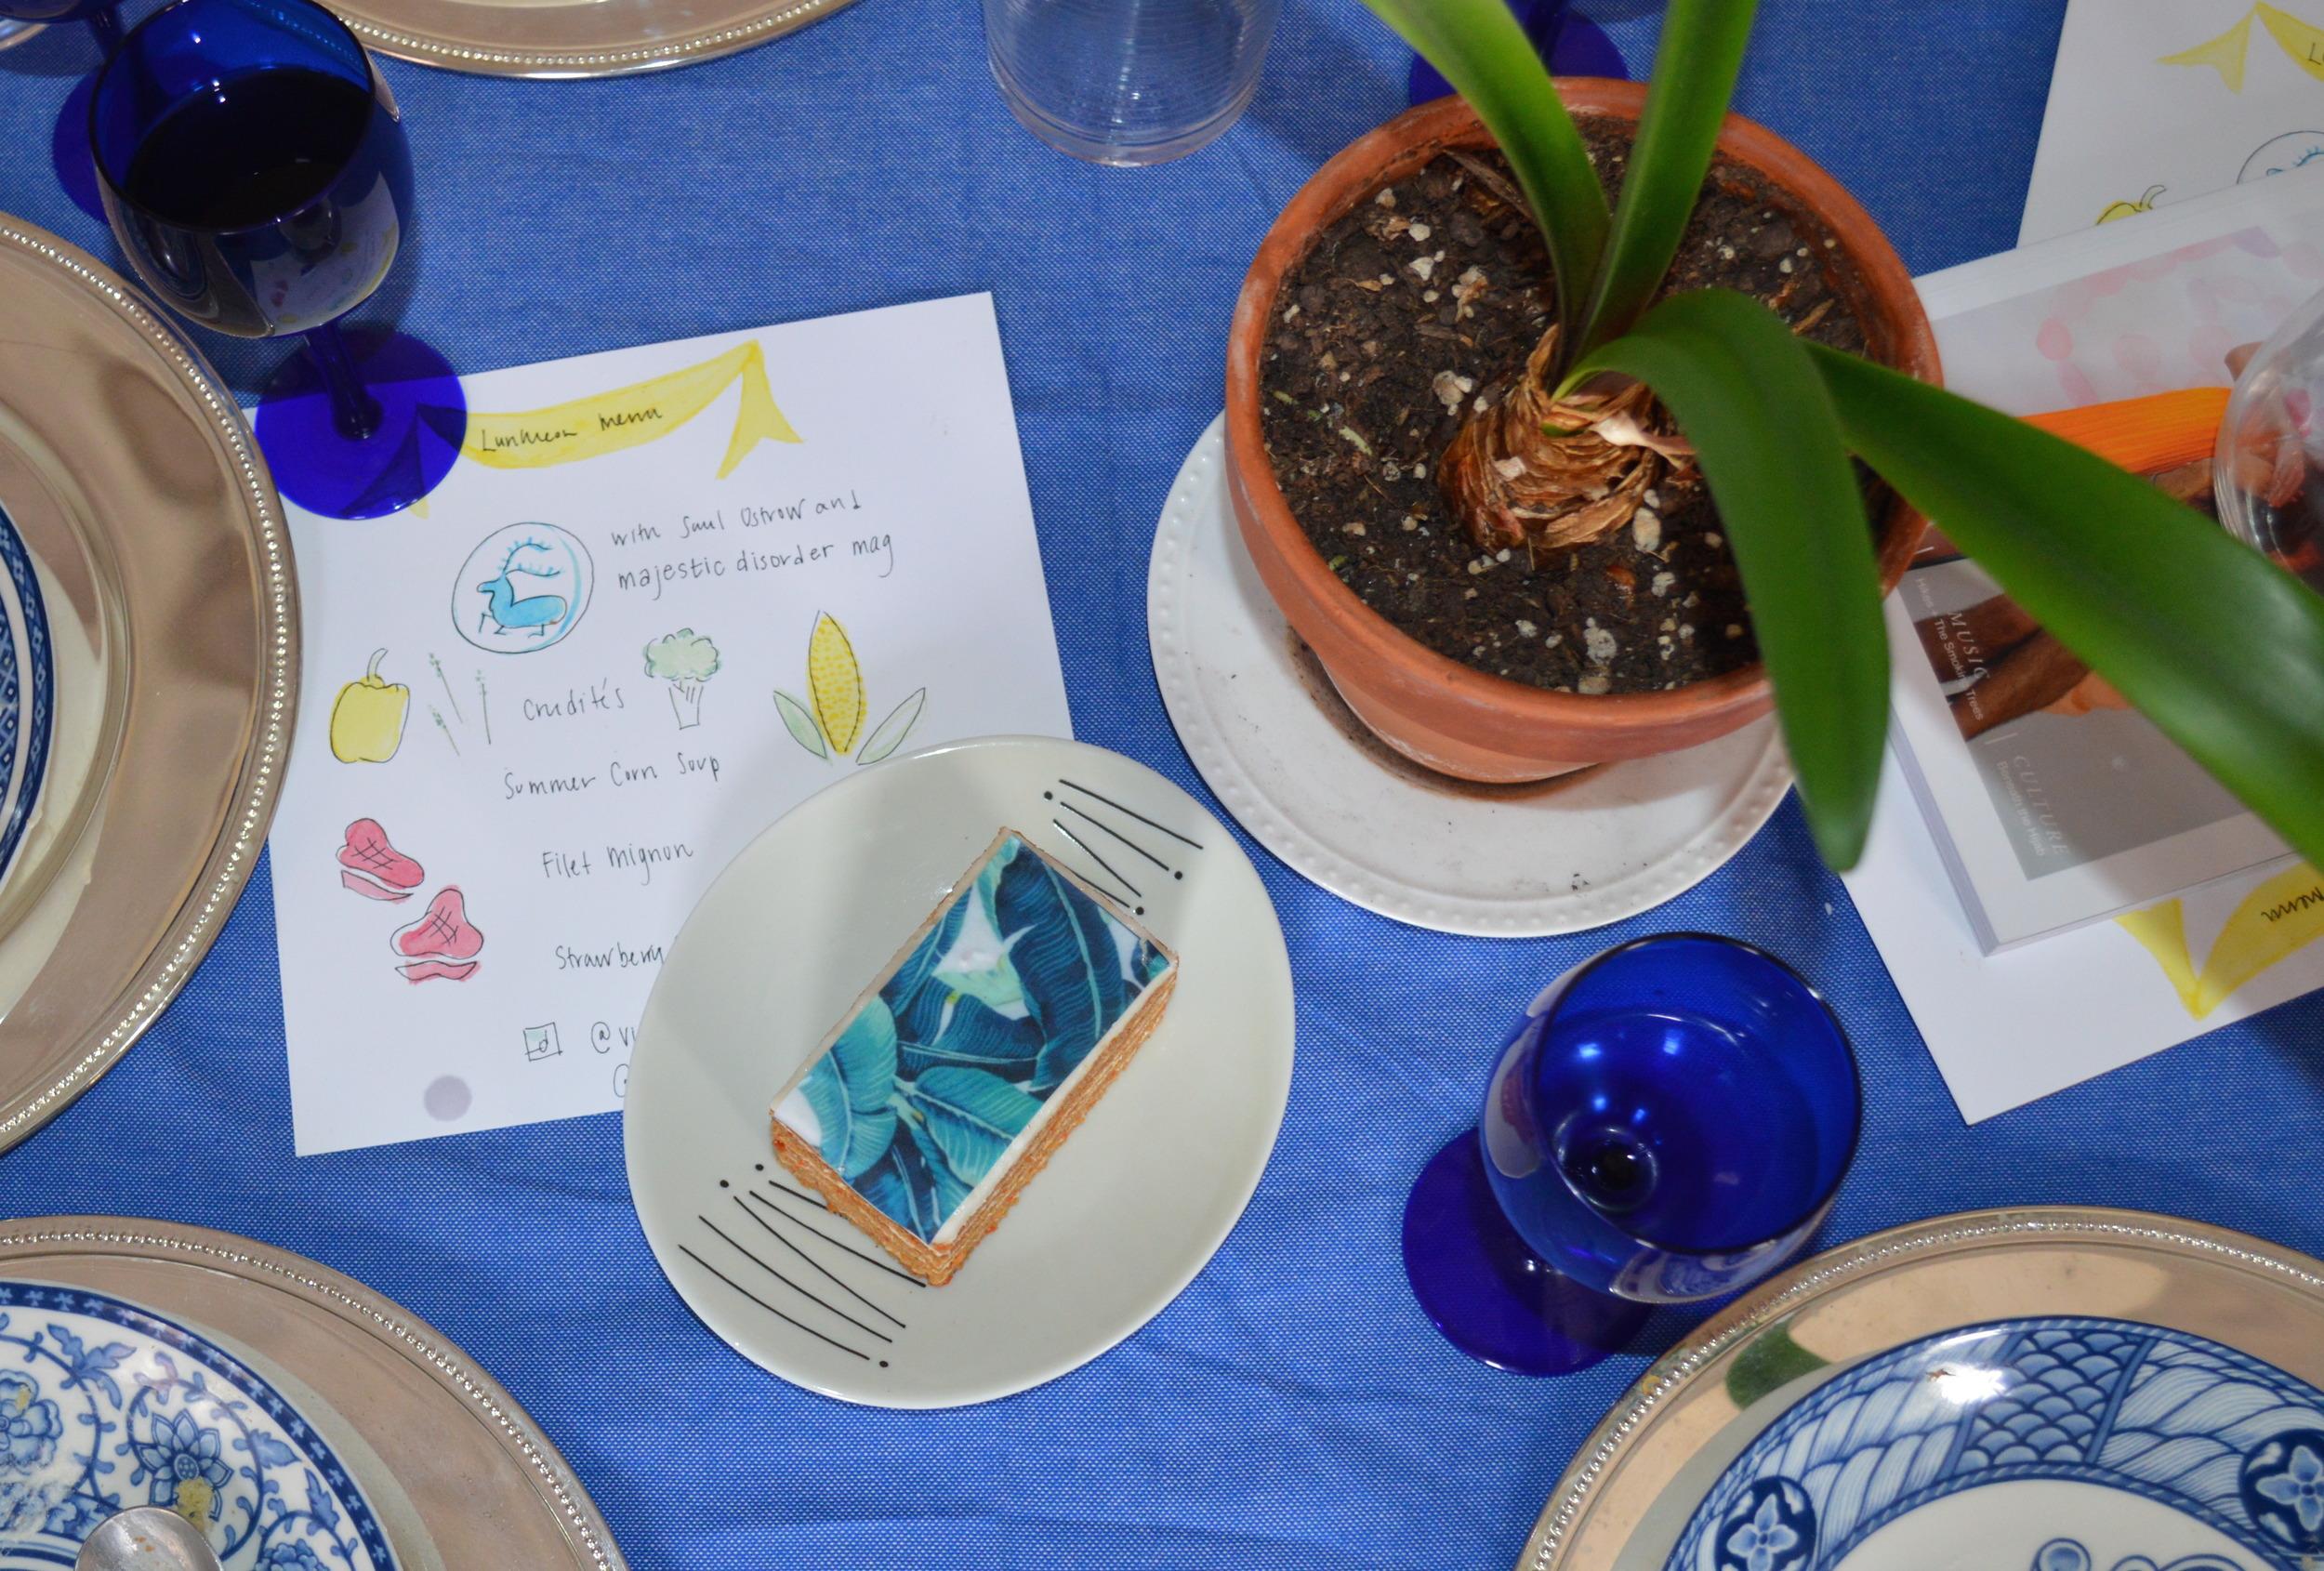 Palm leaf carrot cake below palm leaf centerpieces.